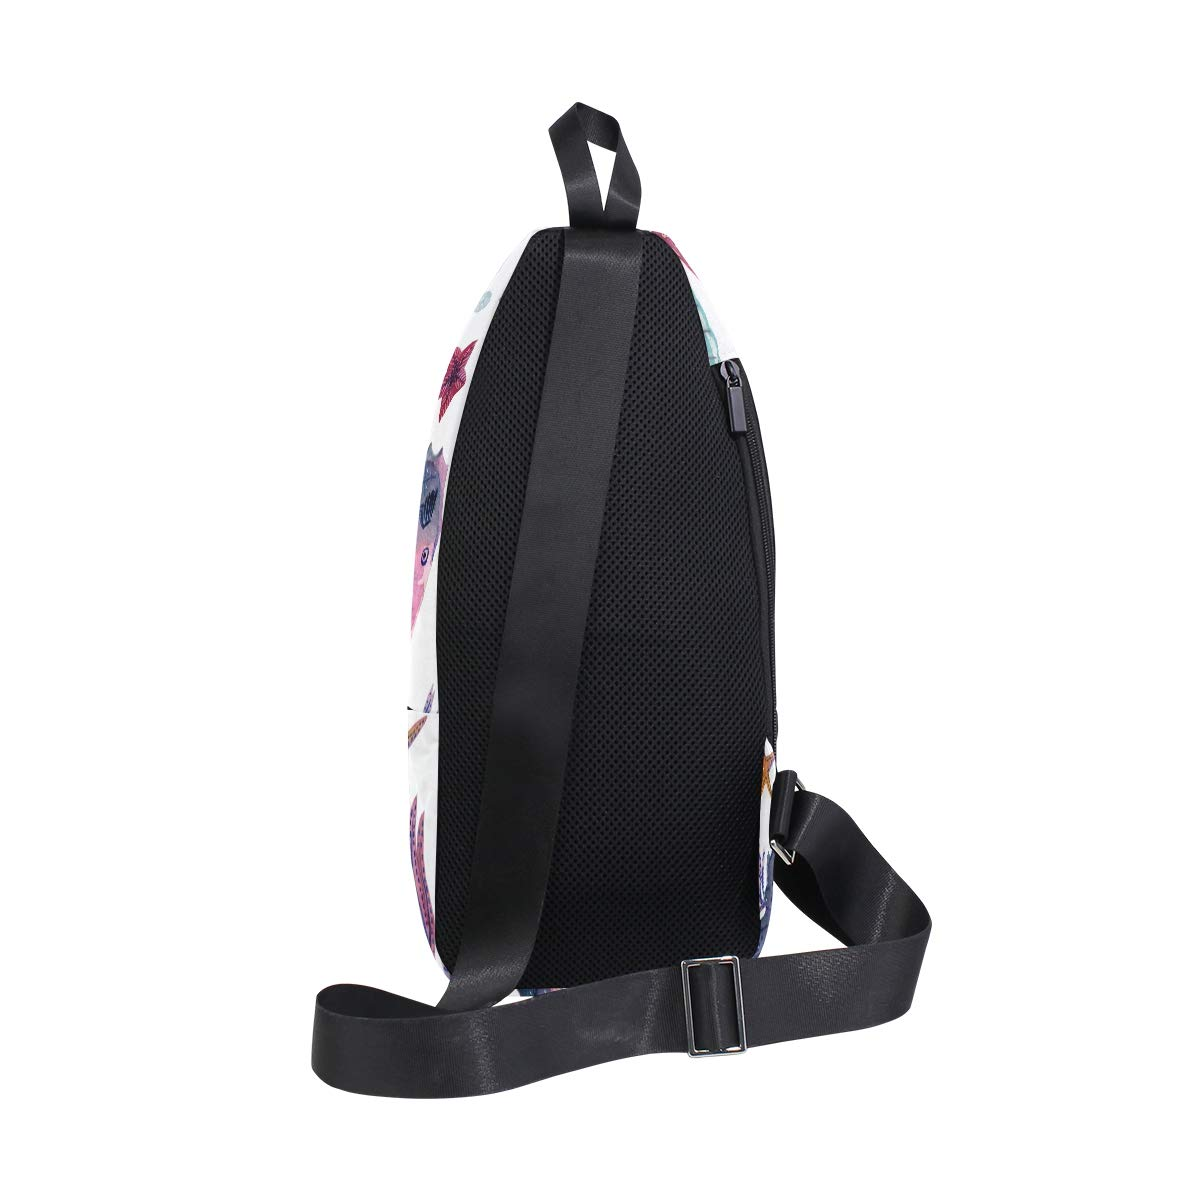 TFONE Cute Sea Horse Ocean Animal Crossbody Bag Lightweight Chest Shoulder Messenger Pack Backpack Sling Bag